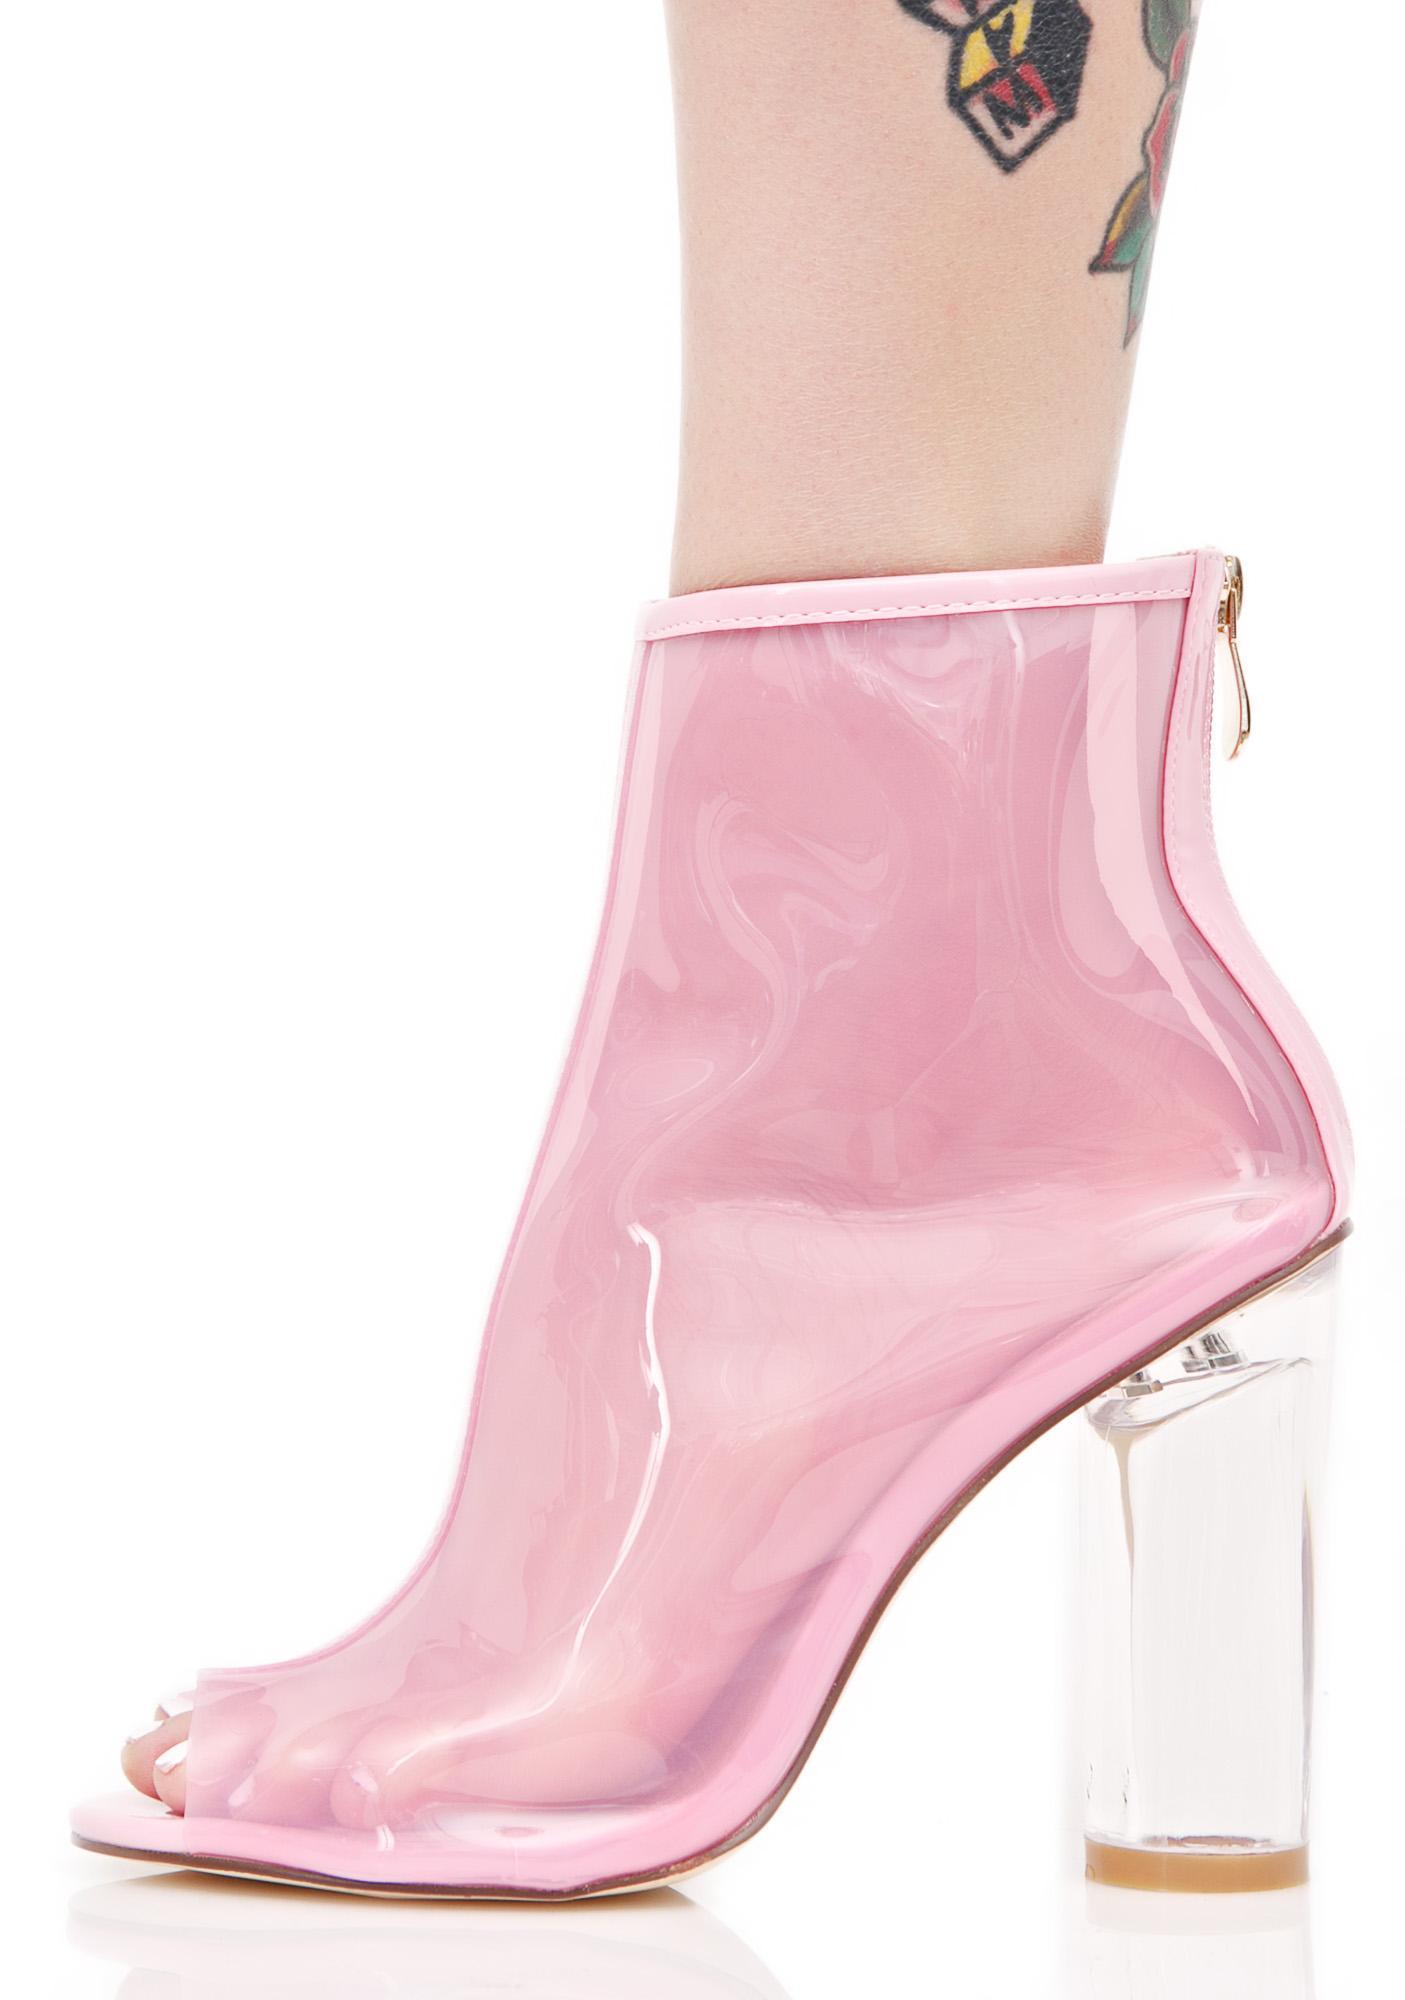 Princess Pisces Peep-Toe Boots